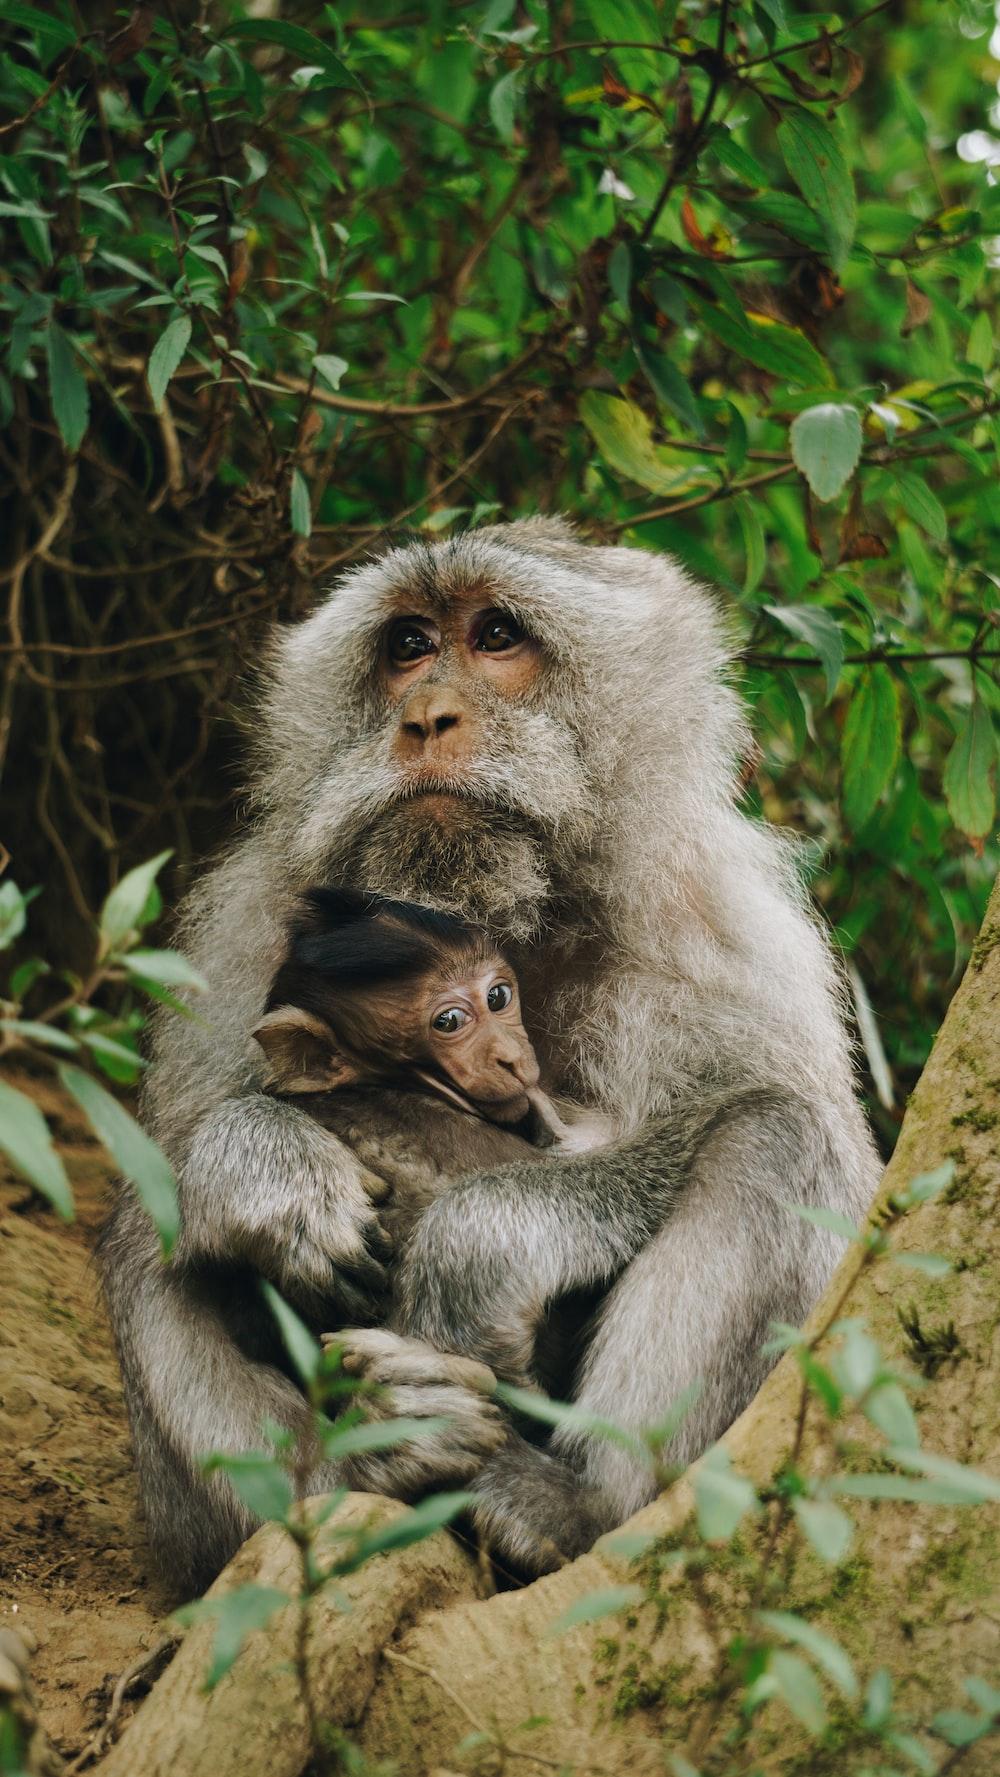 gray monkey carrying baby monkey at daytime